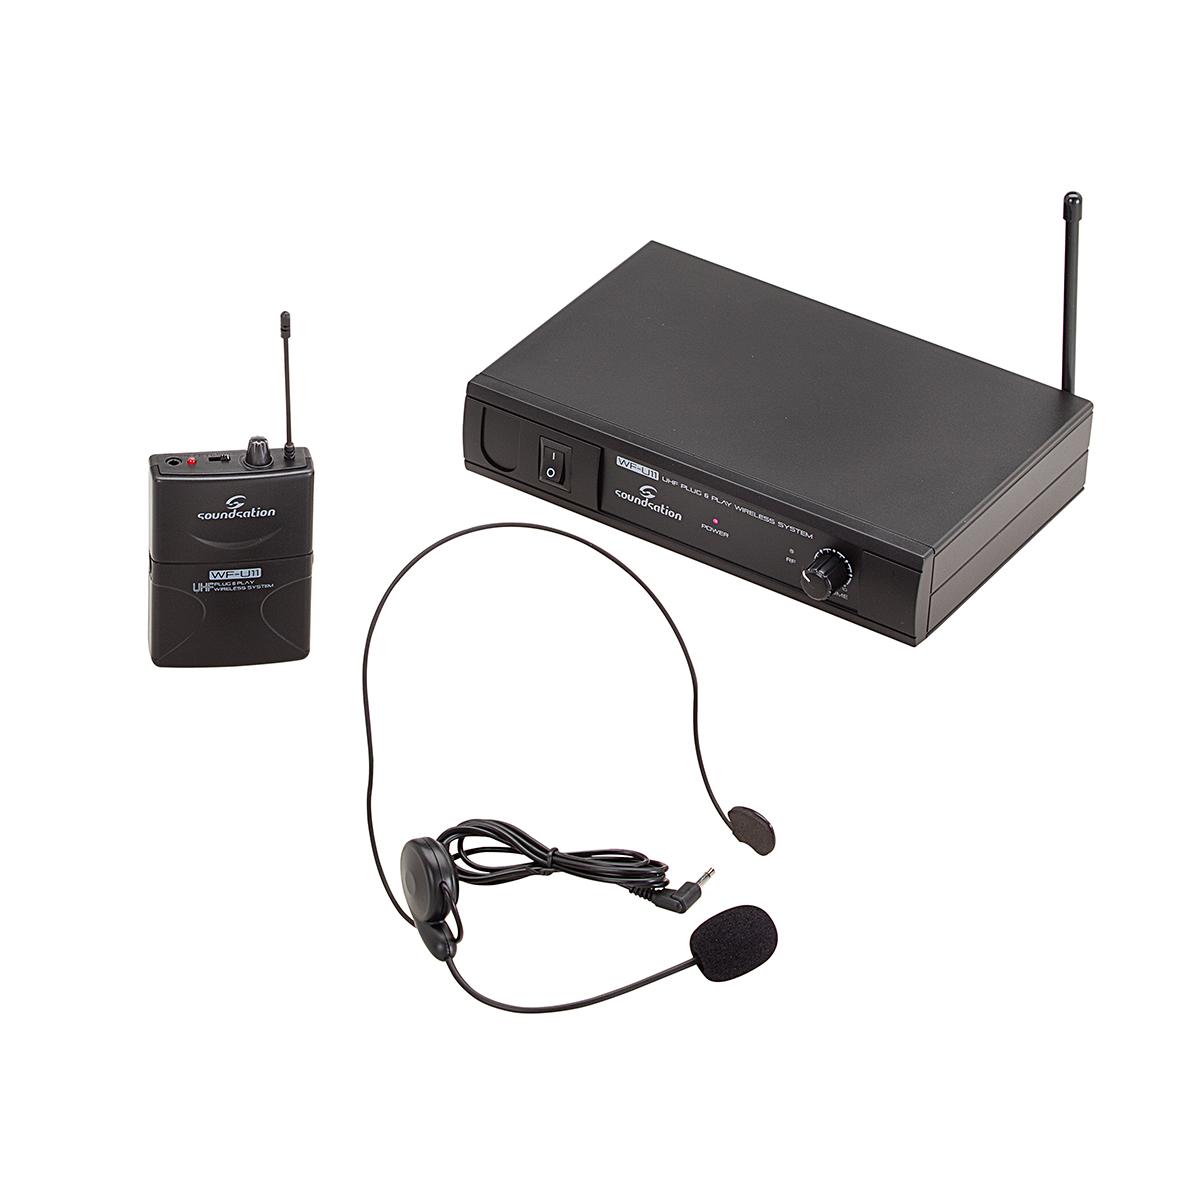 RADIOMICROFONO UHF SOUNDSATION WF-U11PD BODYPACK & HEADSET 865.00 MHz